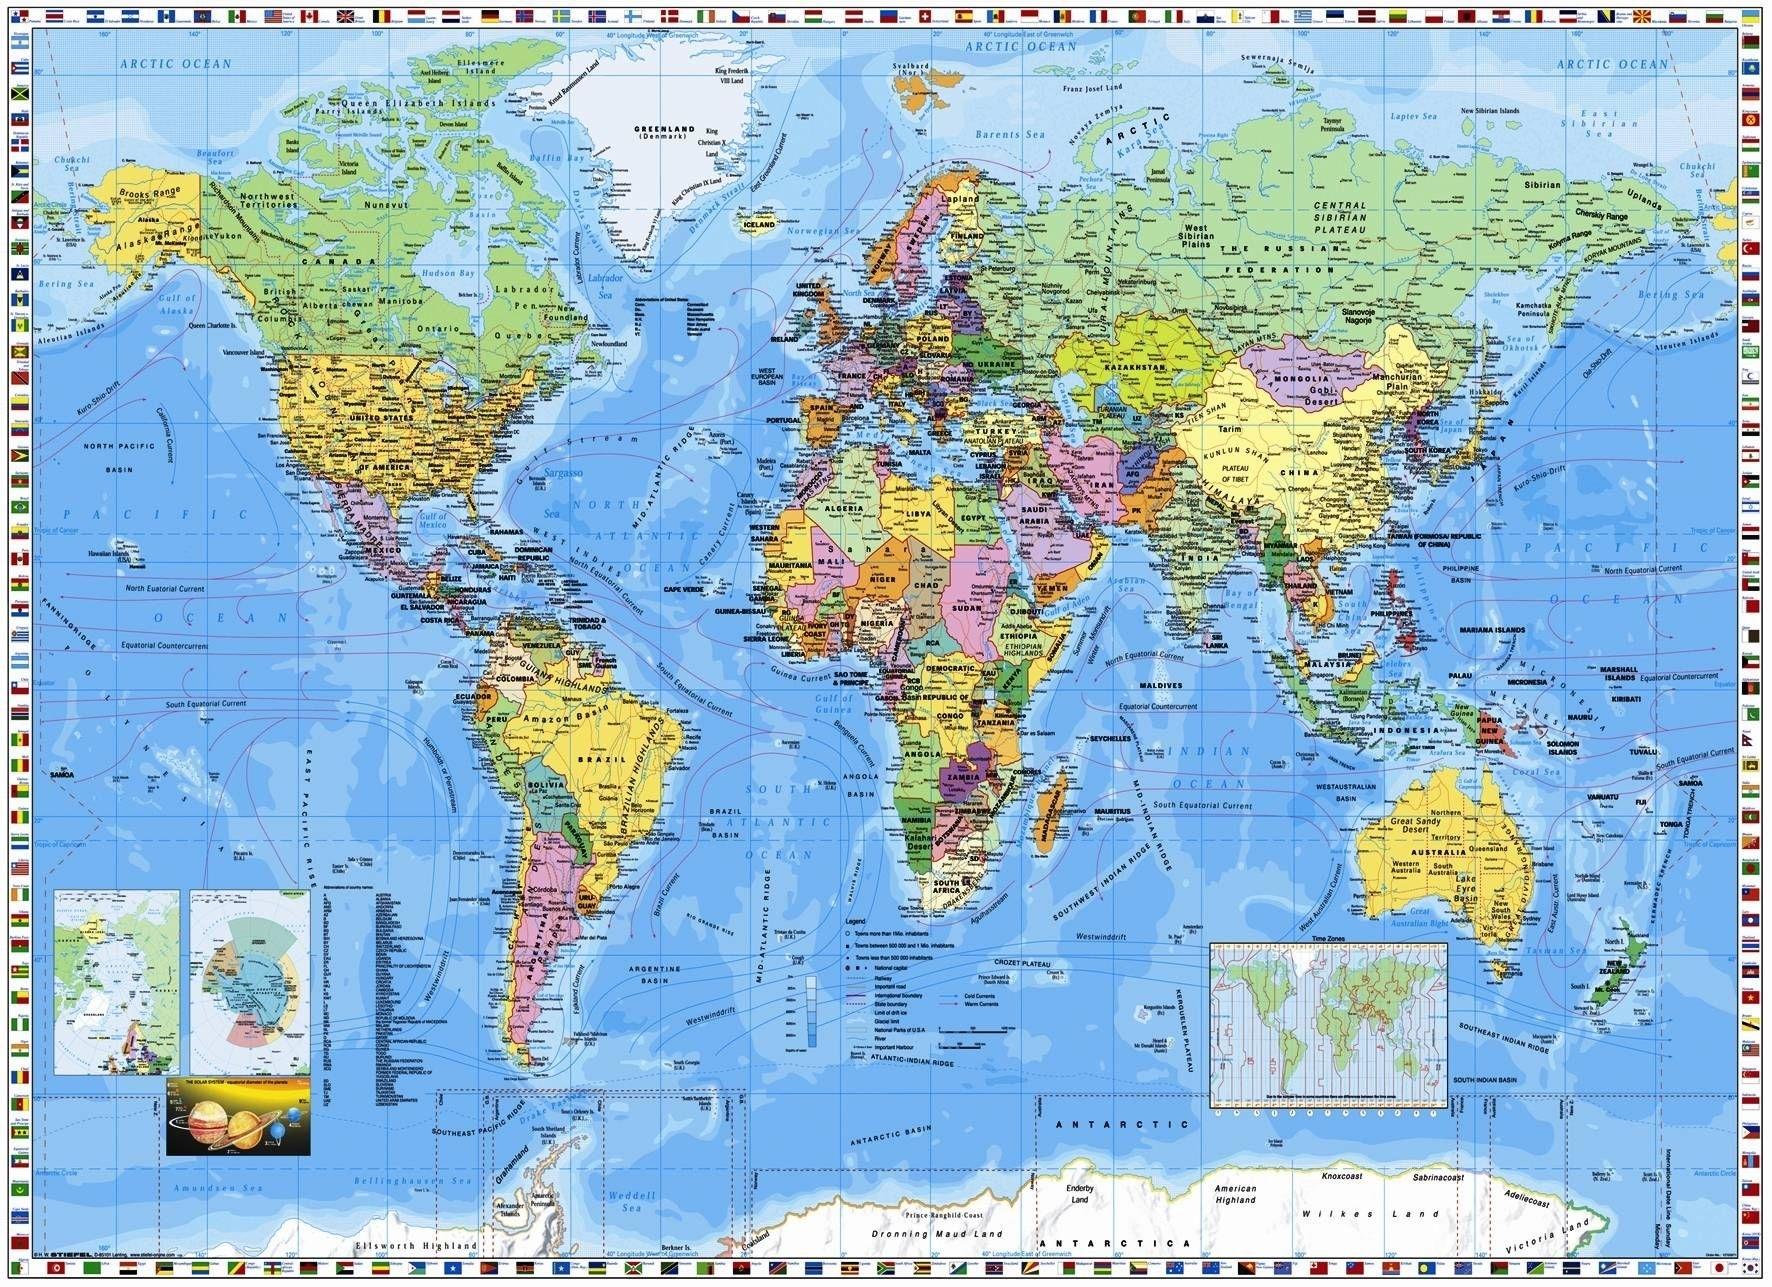 world map wallpapers high resolution - wallpaper cave | best games